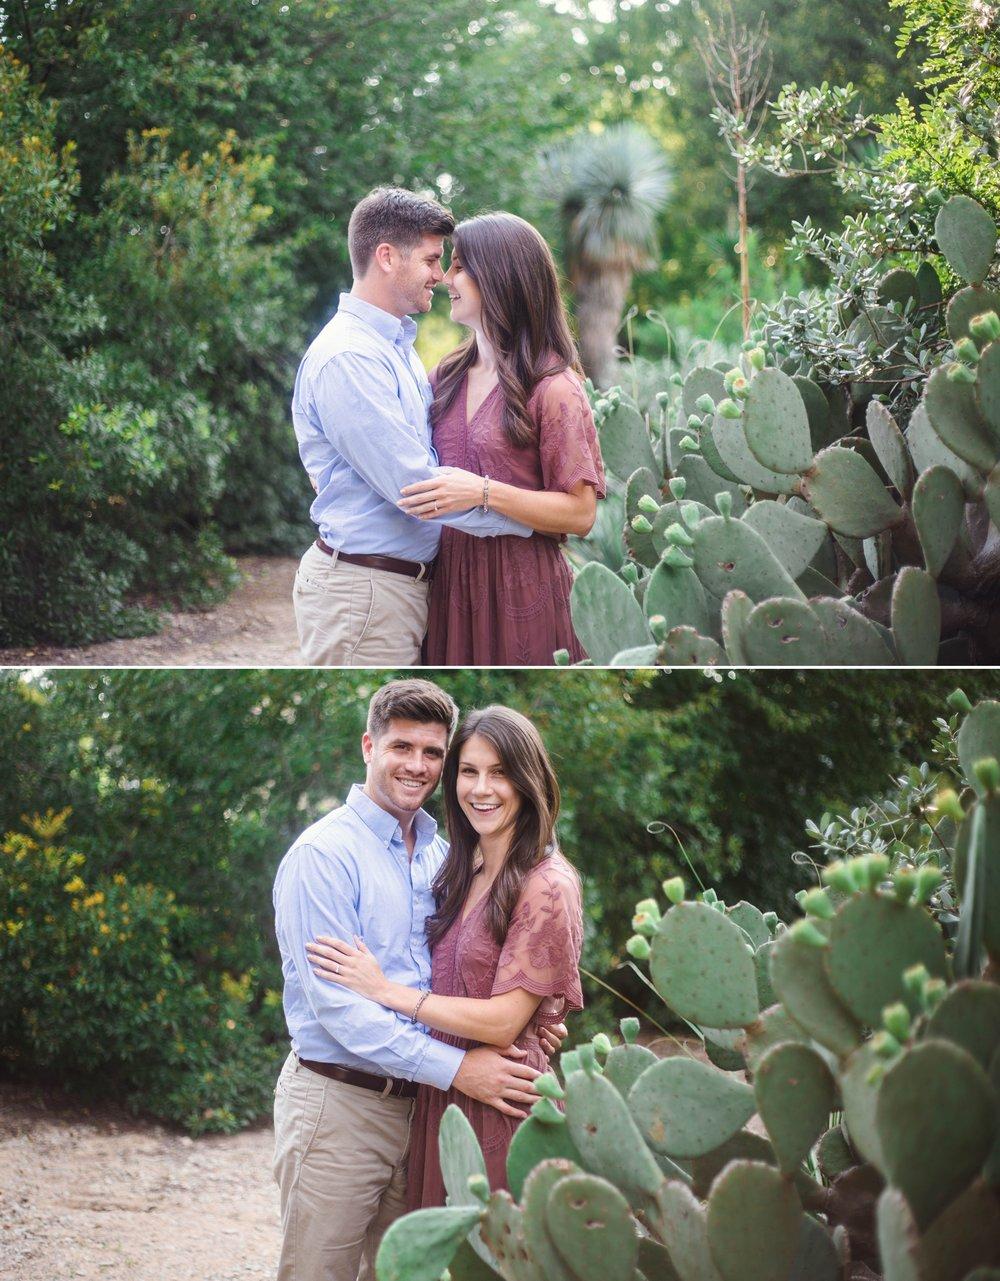 Desert inspiritation - Aryn + Tyler - Engagement Photography Session at the JC Raulston Arboretum - Raleigh Wedding Photographer